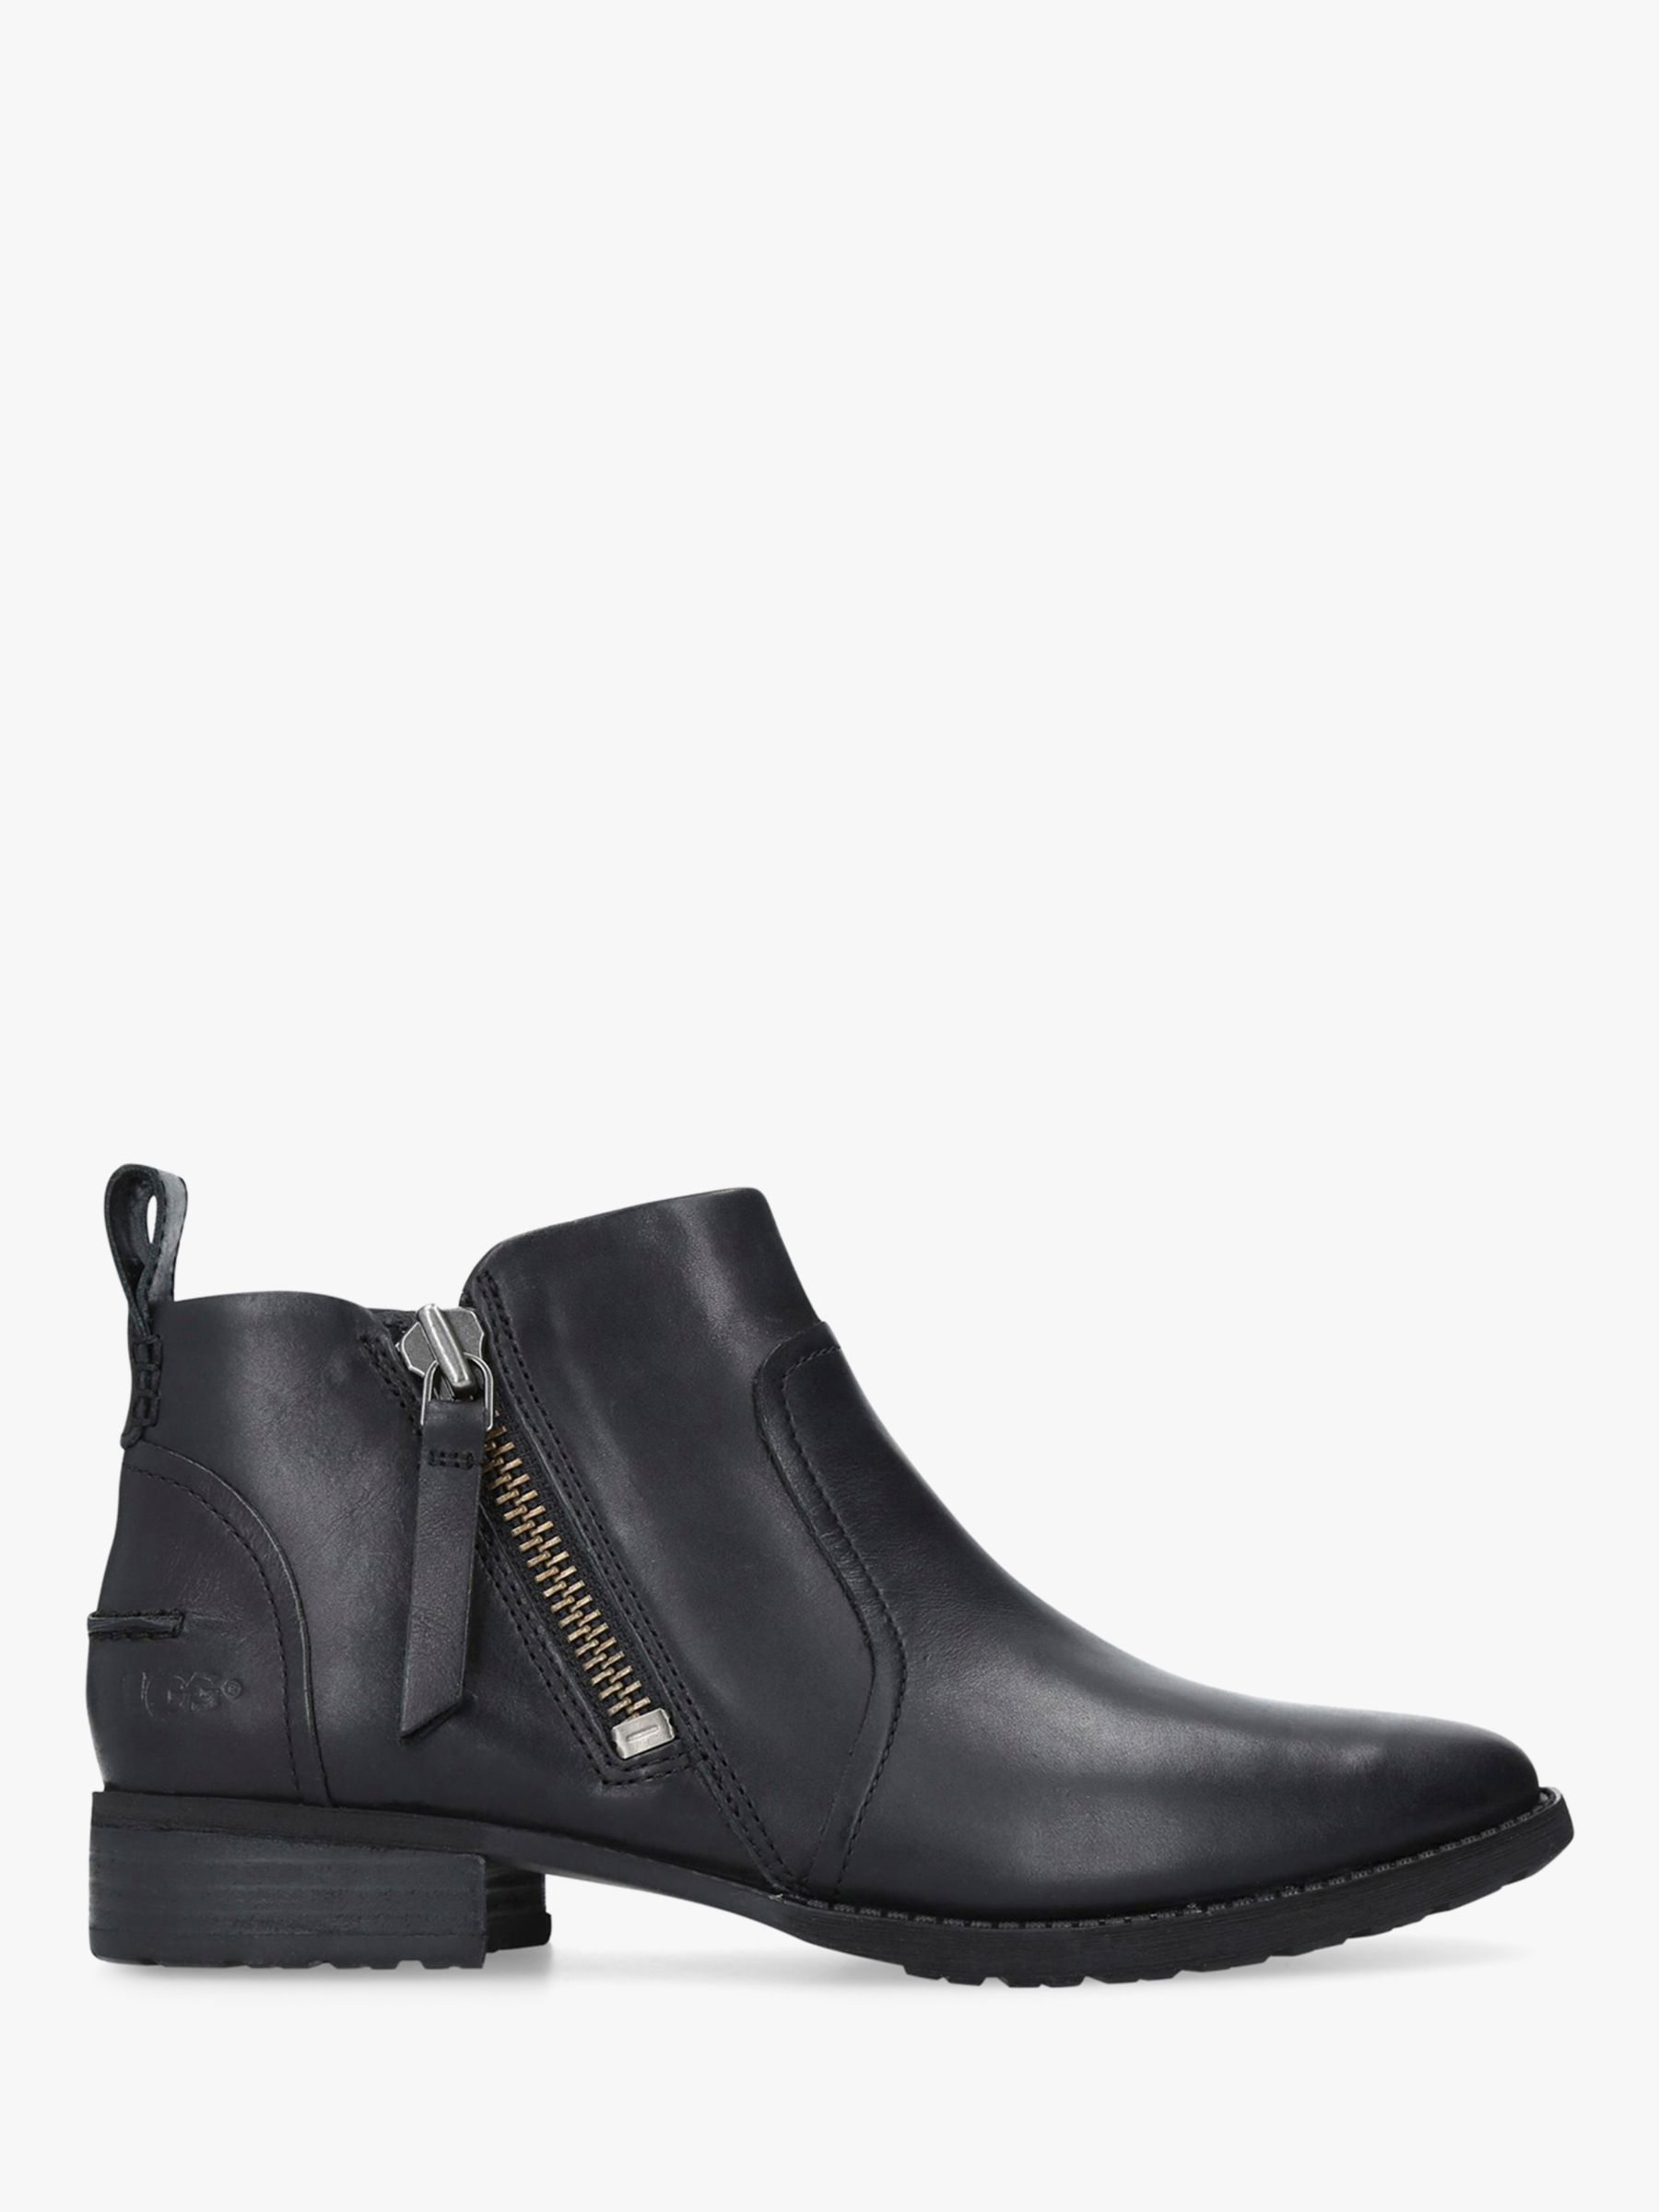 cda0e099c68 UGG Aureo Zip Ankle Boots at John Lewis & Partners